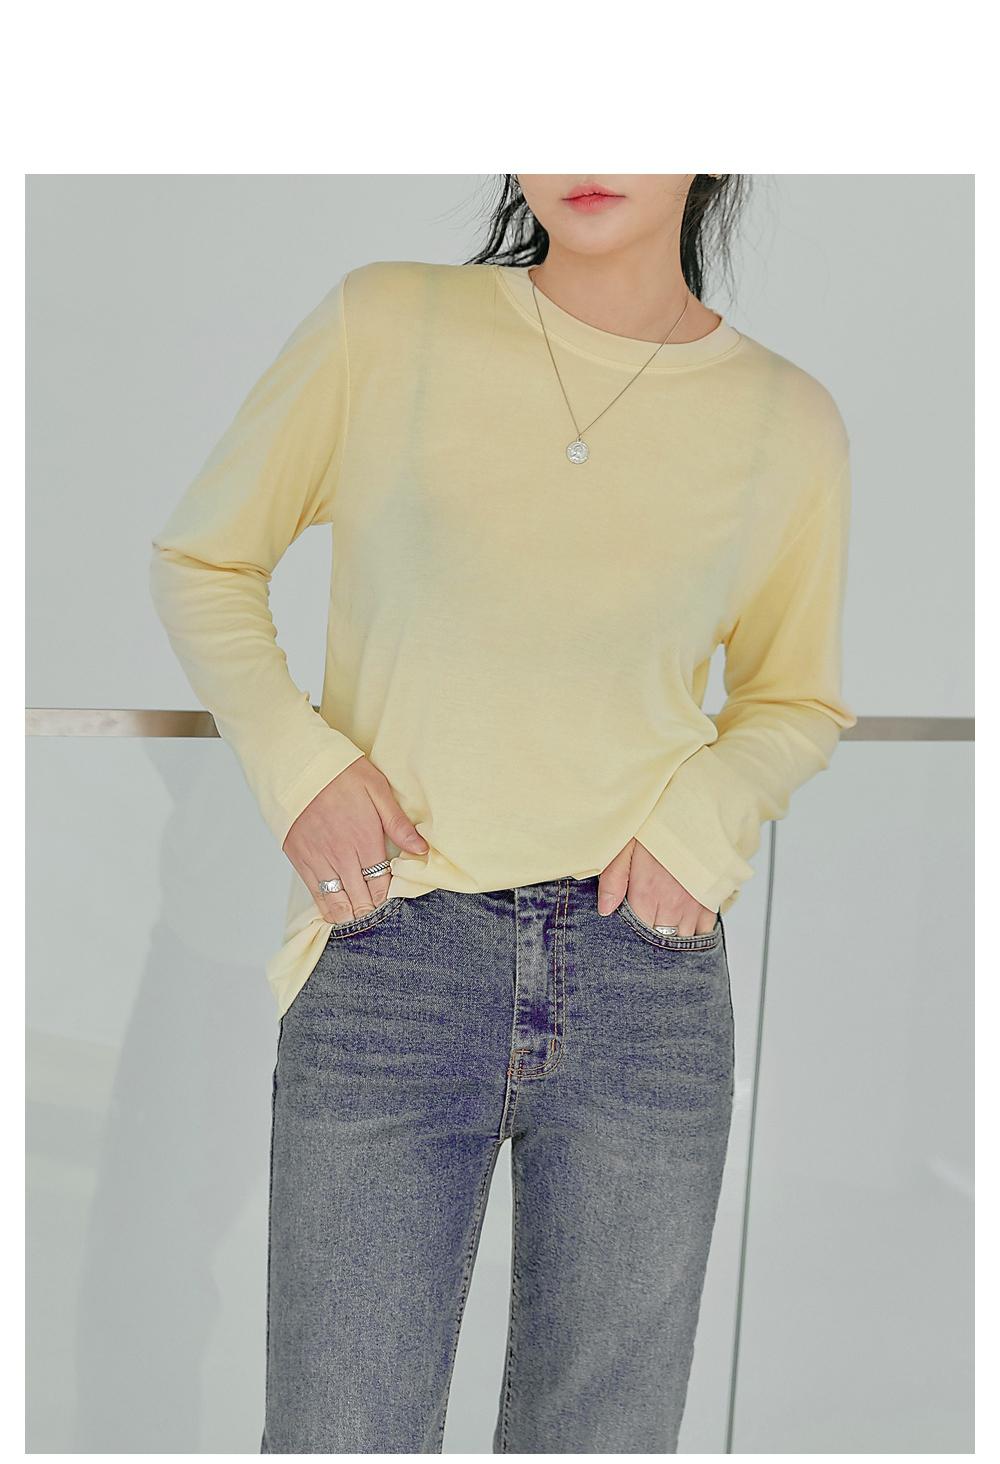 dress model image-S1L6